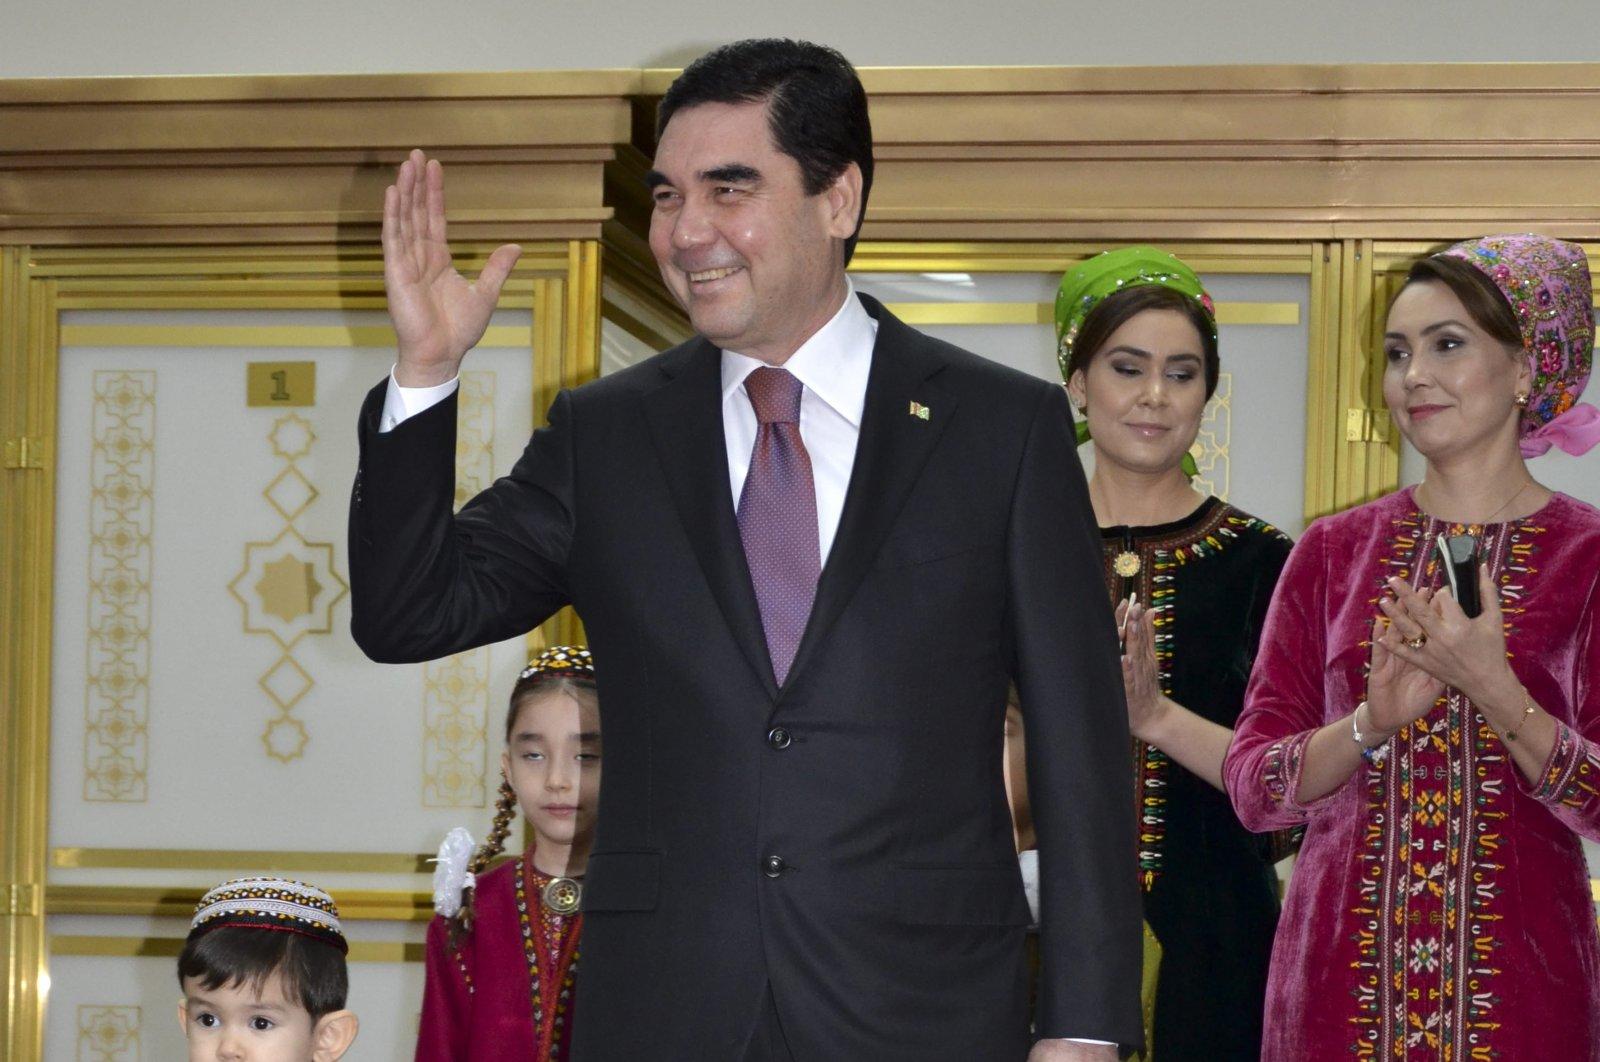 Turkmenistan President Gurbanguly Berdimuhamedov, center, greets journalists after casting his ballot at a polling station in Ashgabat, Turkmenistan, Sunday, Feb. 12, 2017. (AP Photo)